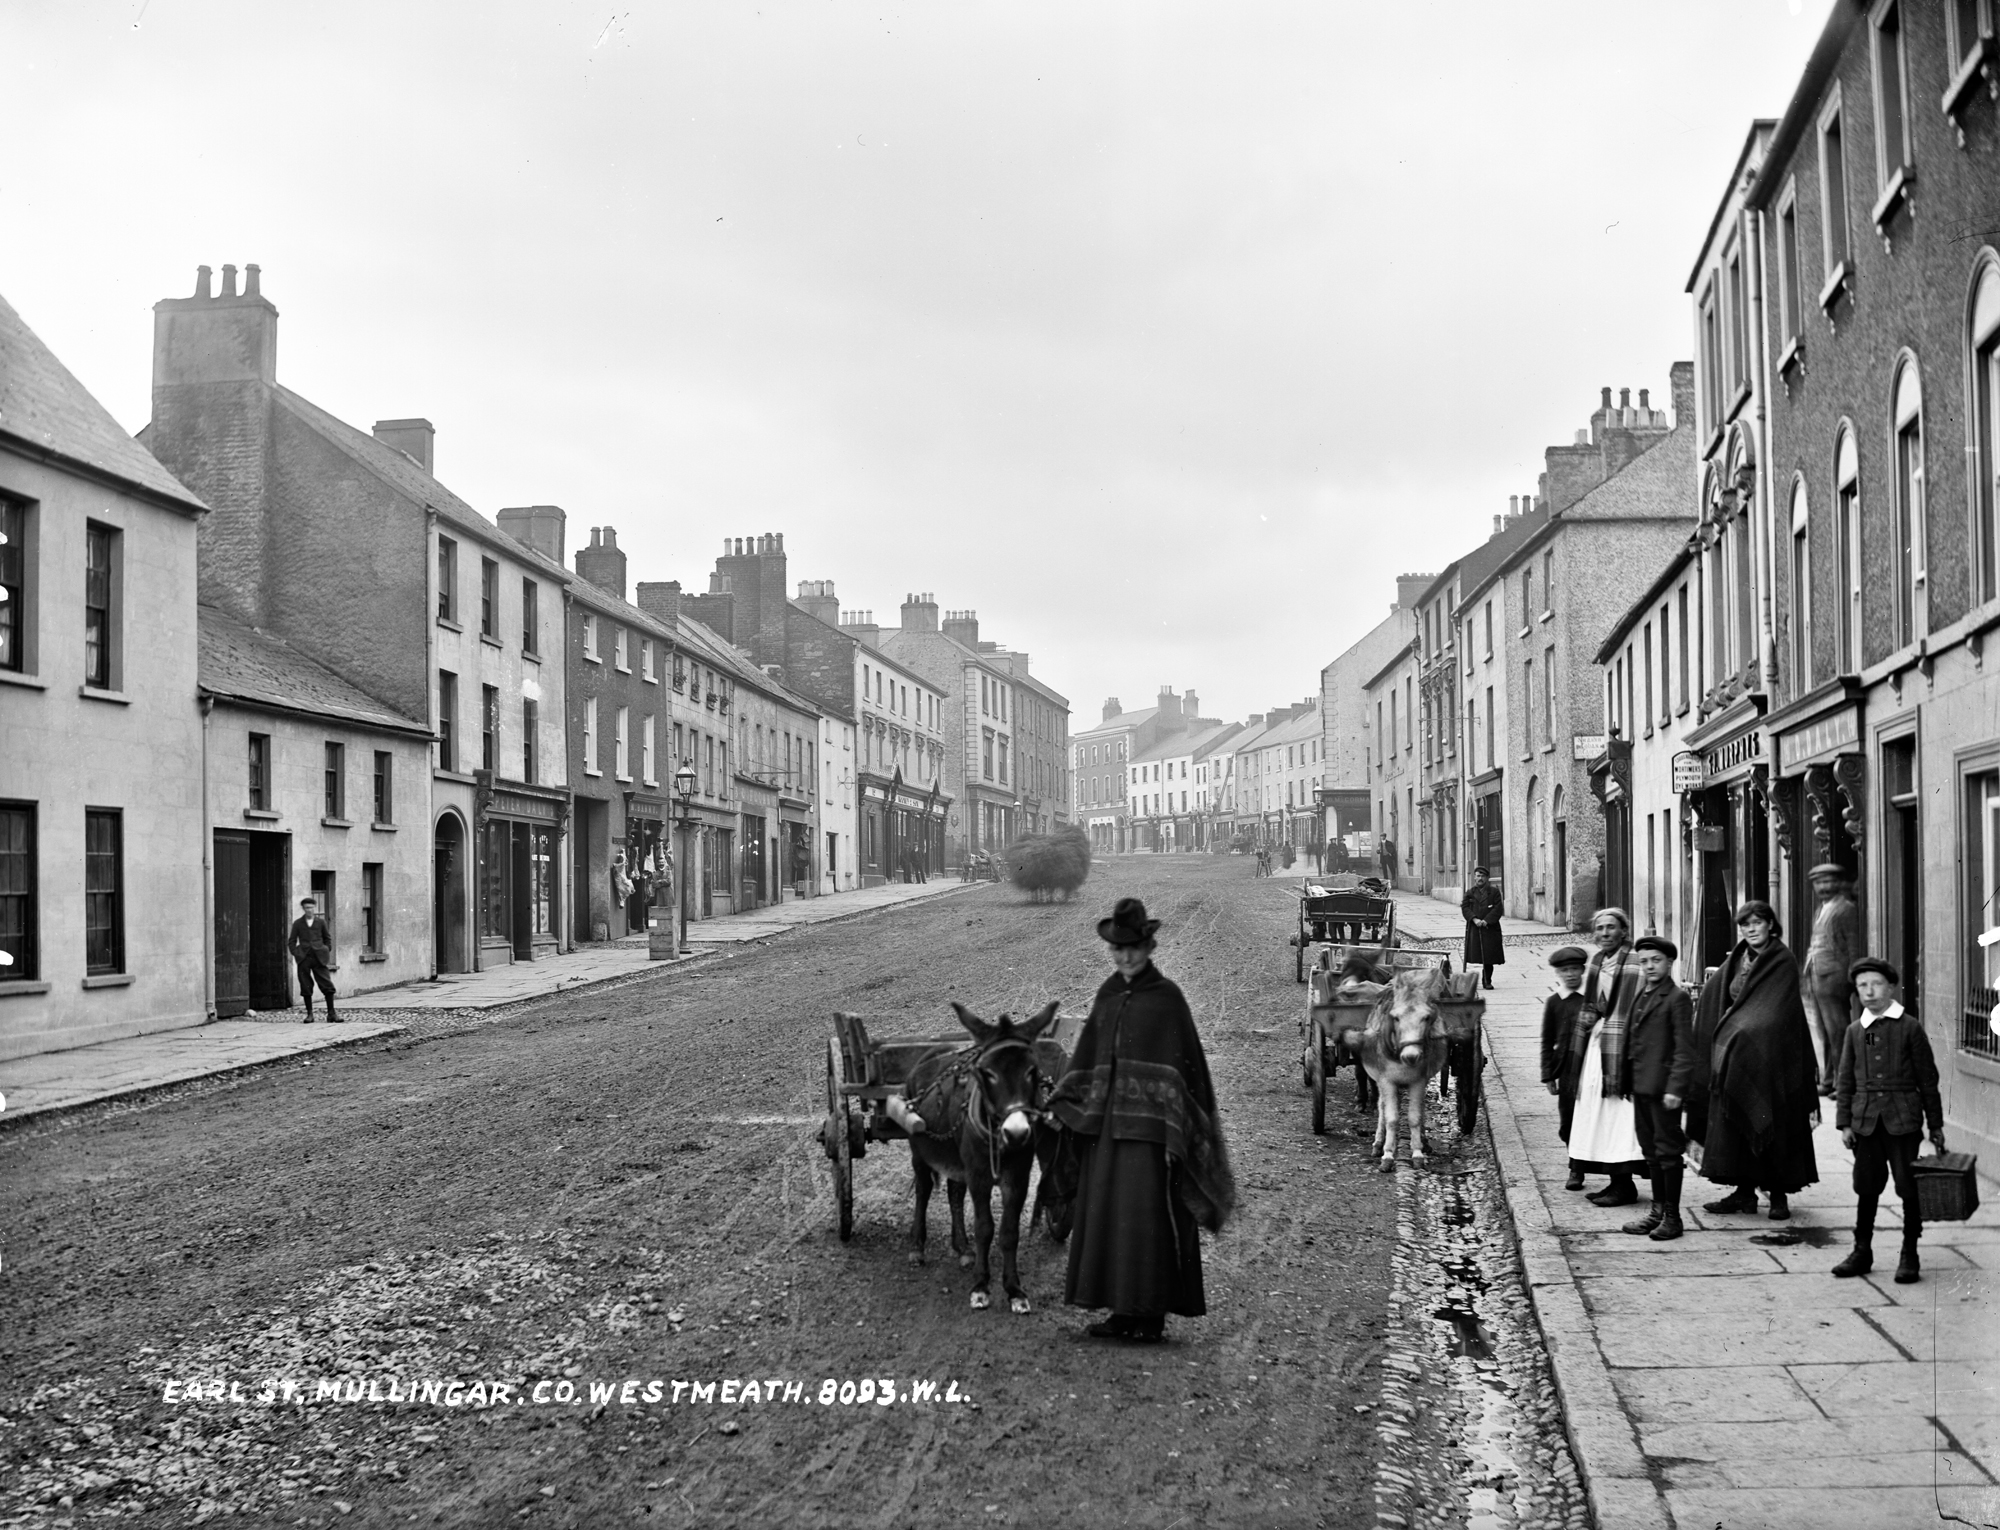 Earl Street, Mullingar, Co. Westmeath